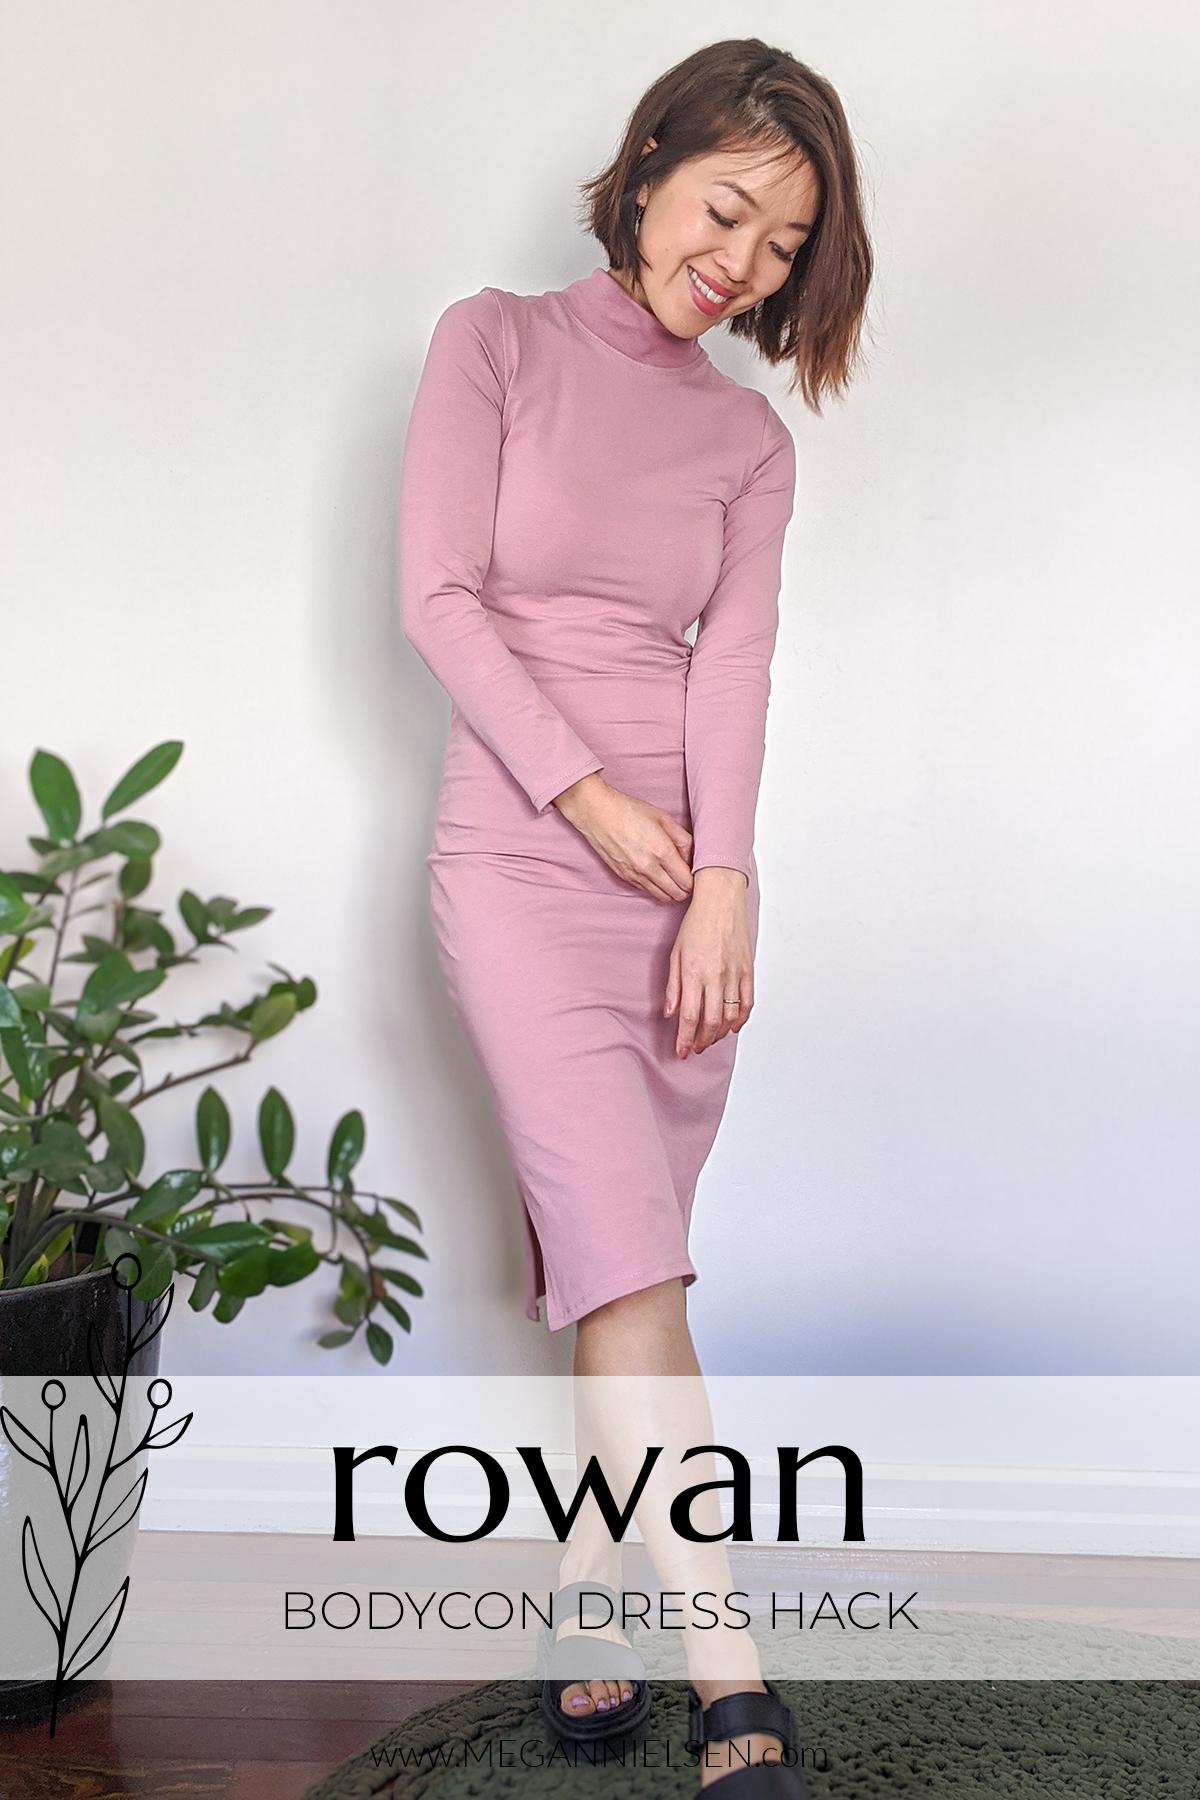 Rowan bodycon dress hack